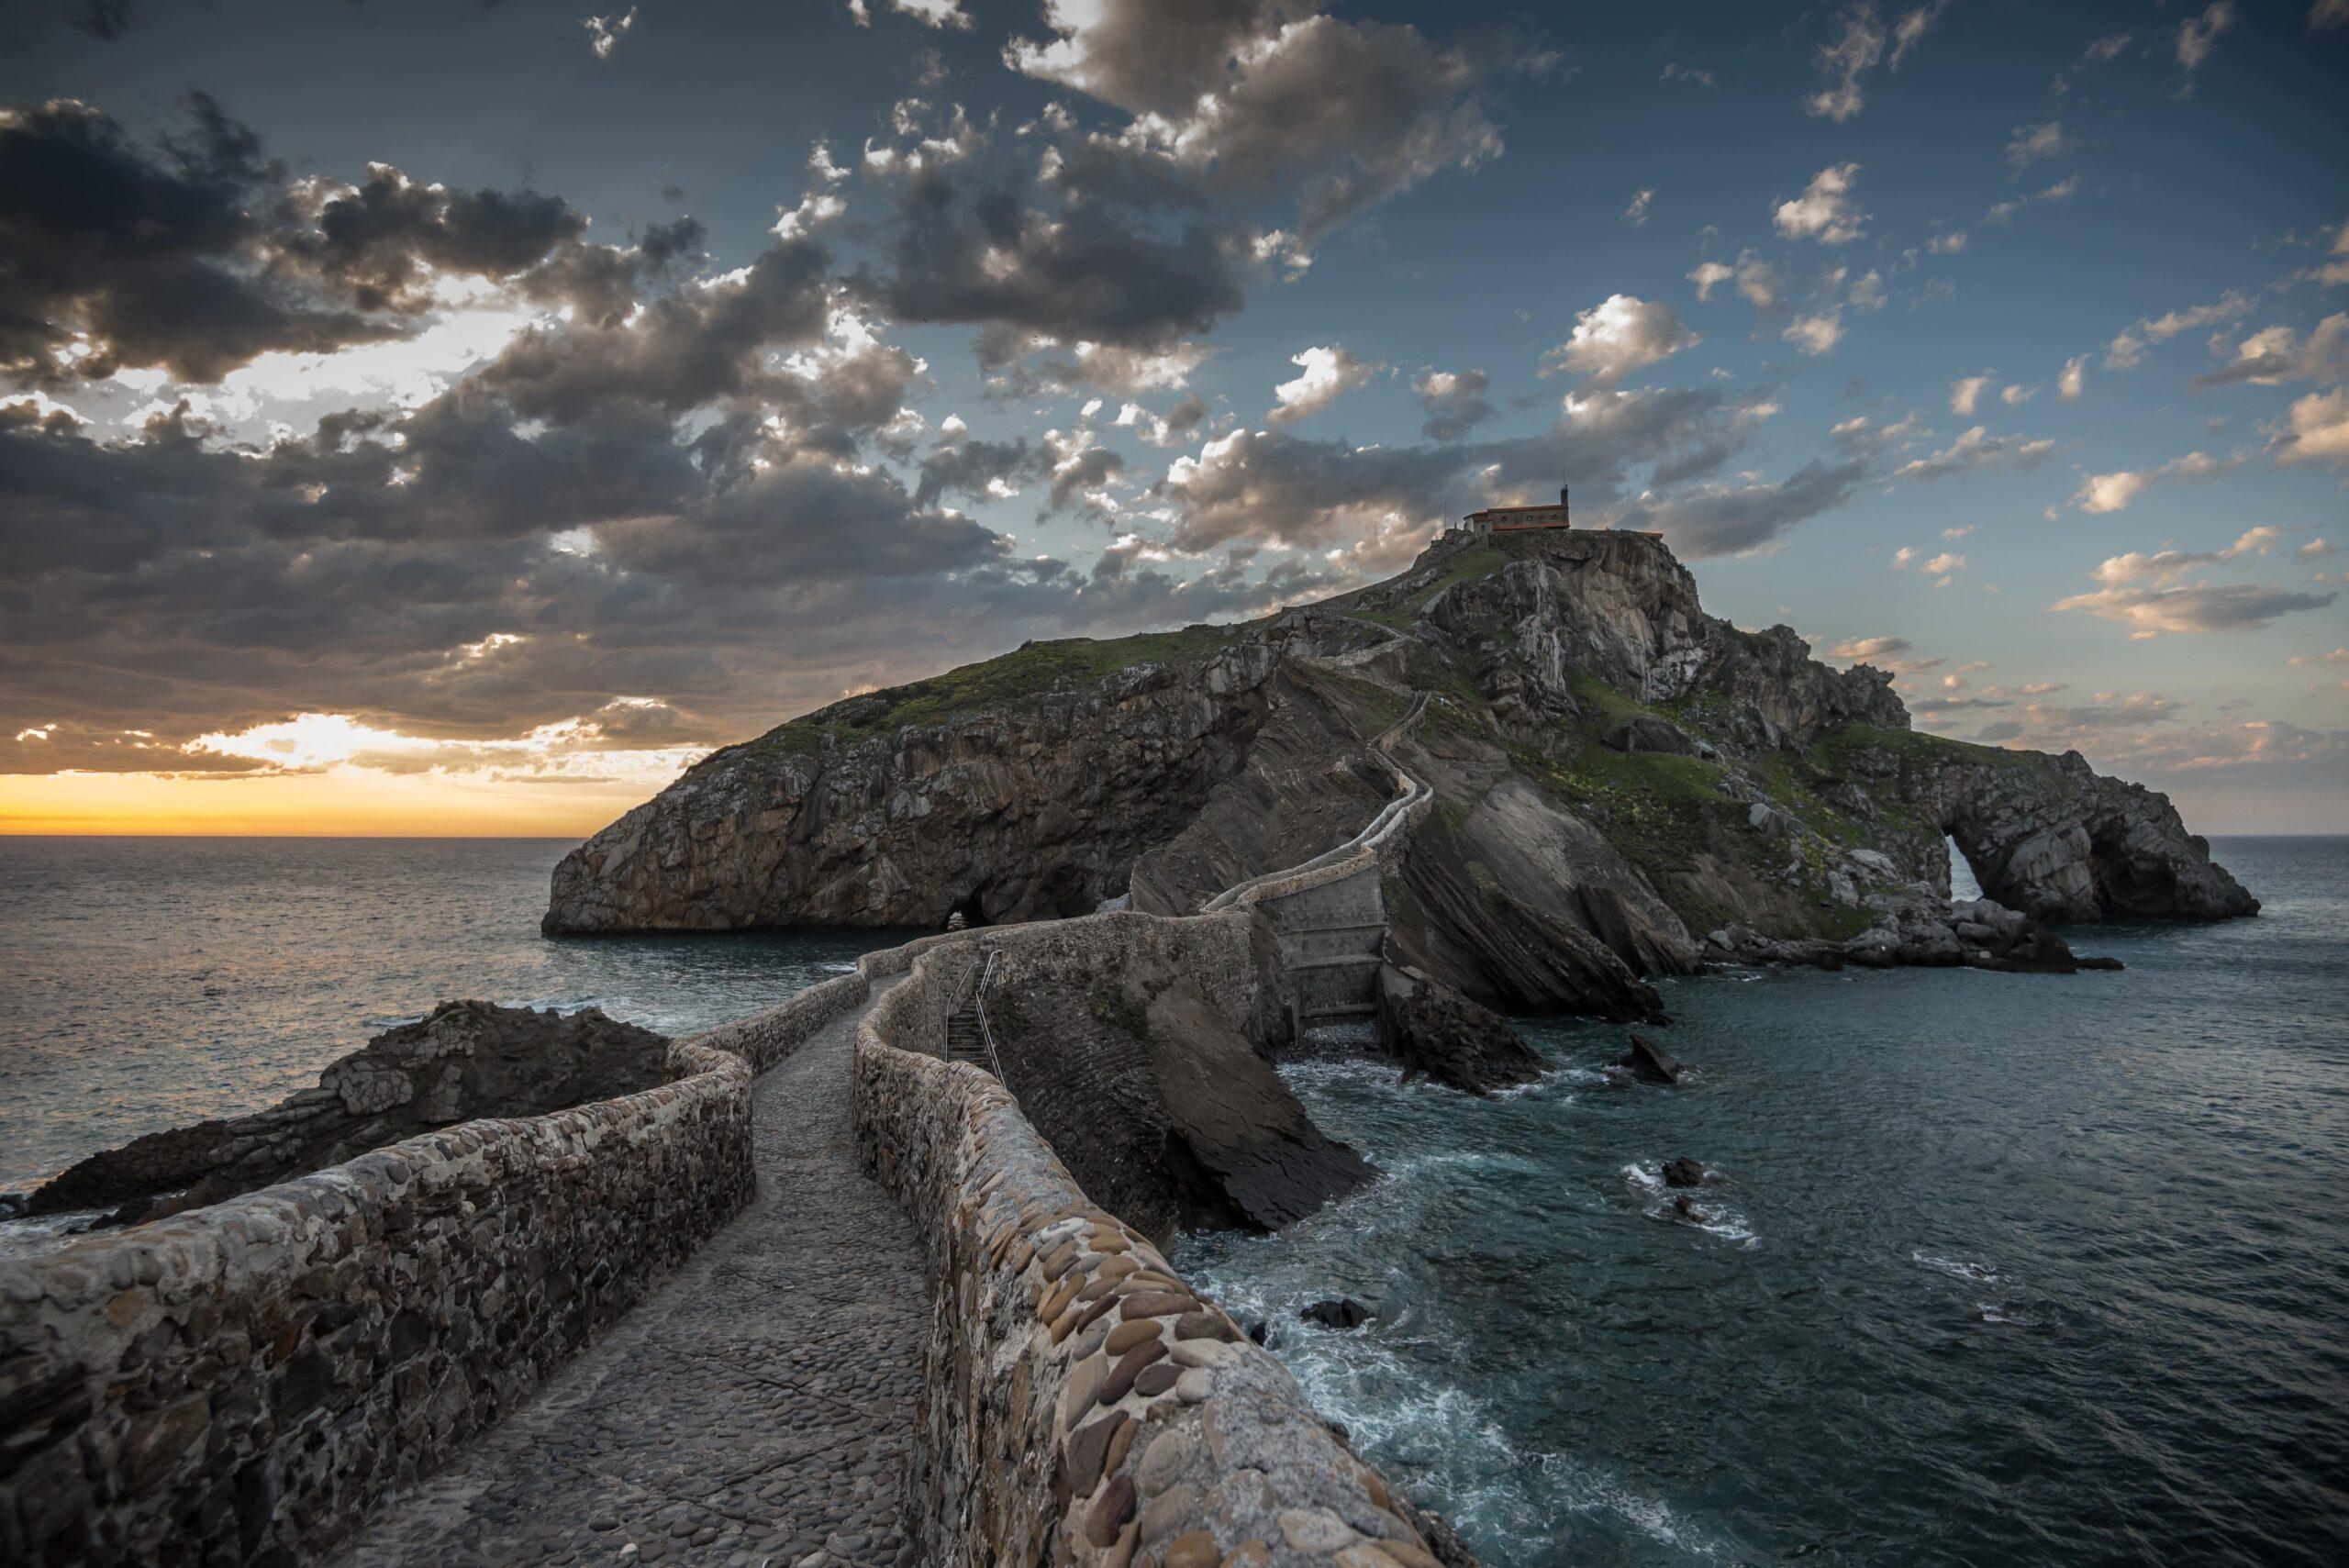 Castle on the ocean